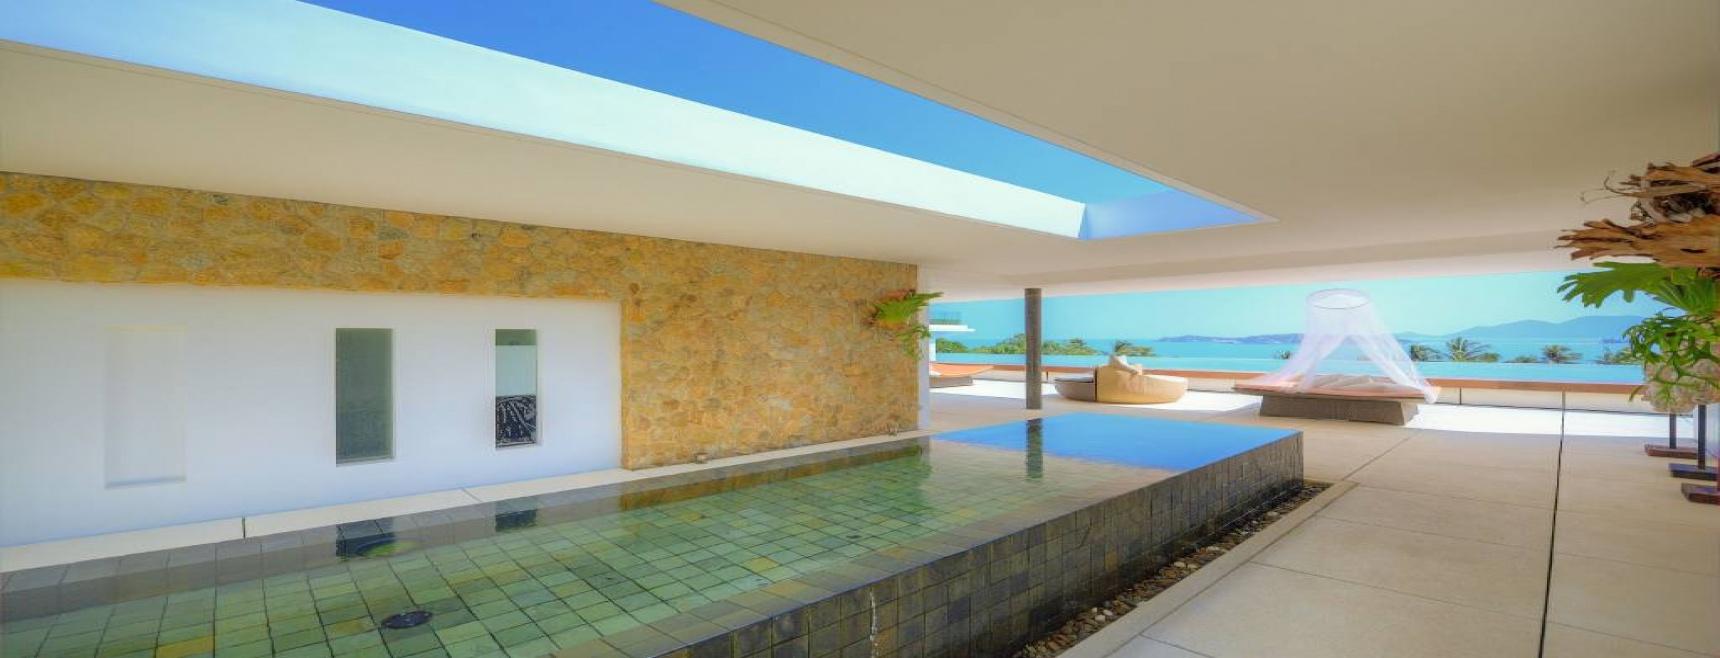 7 Bedrooms, Villa, Holiday Villa Rentals, Listing ID 1118, Choeng Mon, North East, Koh Samui,